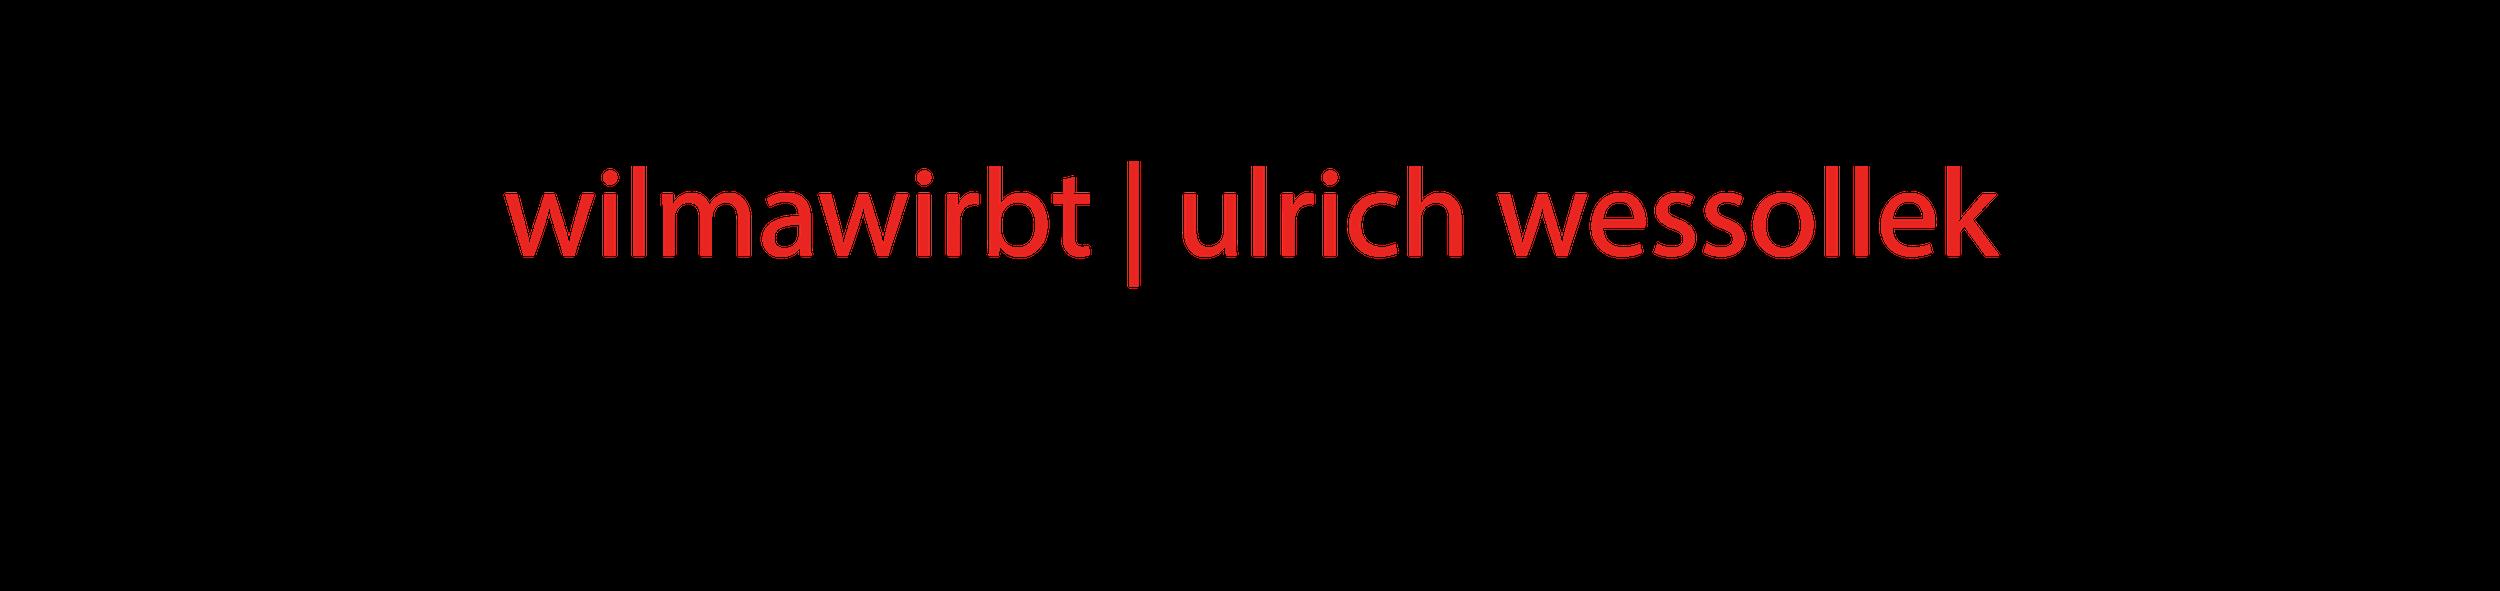 ulrich wessollek | wilmawirbt.de